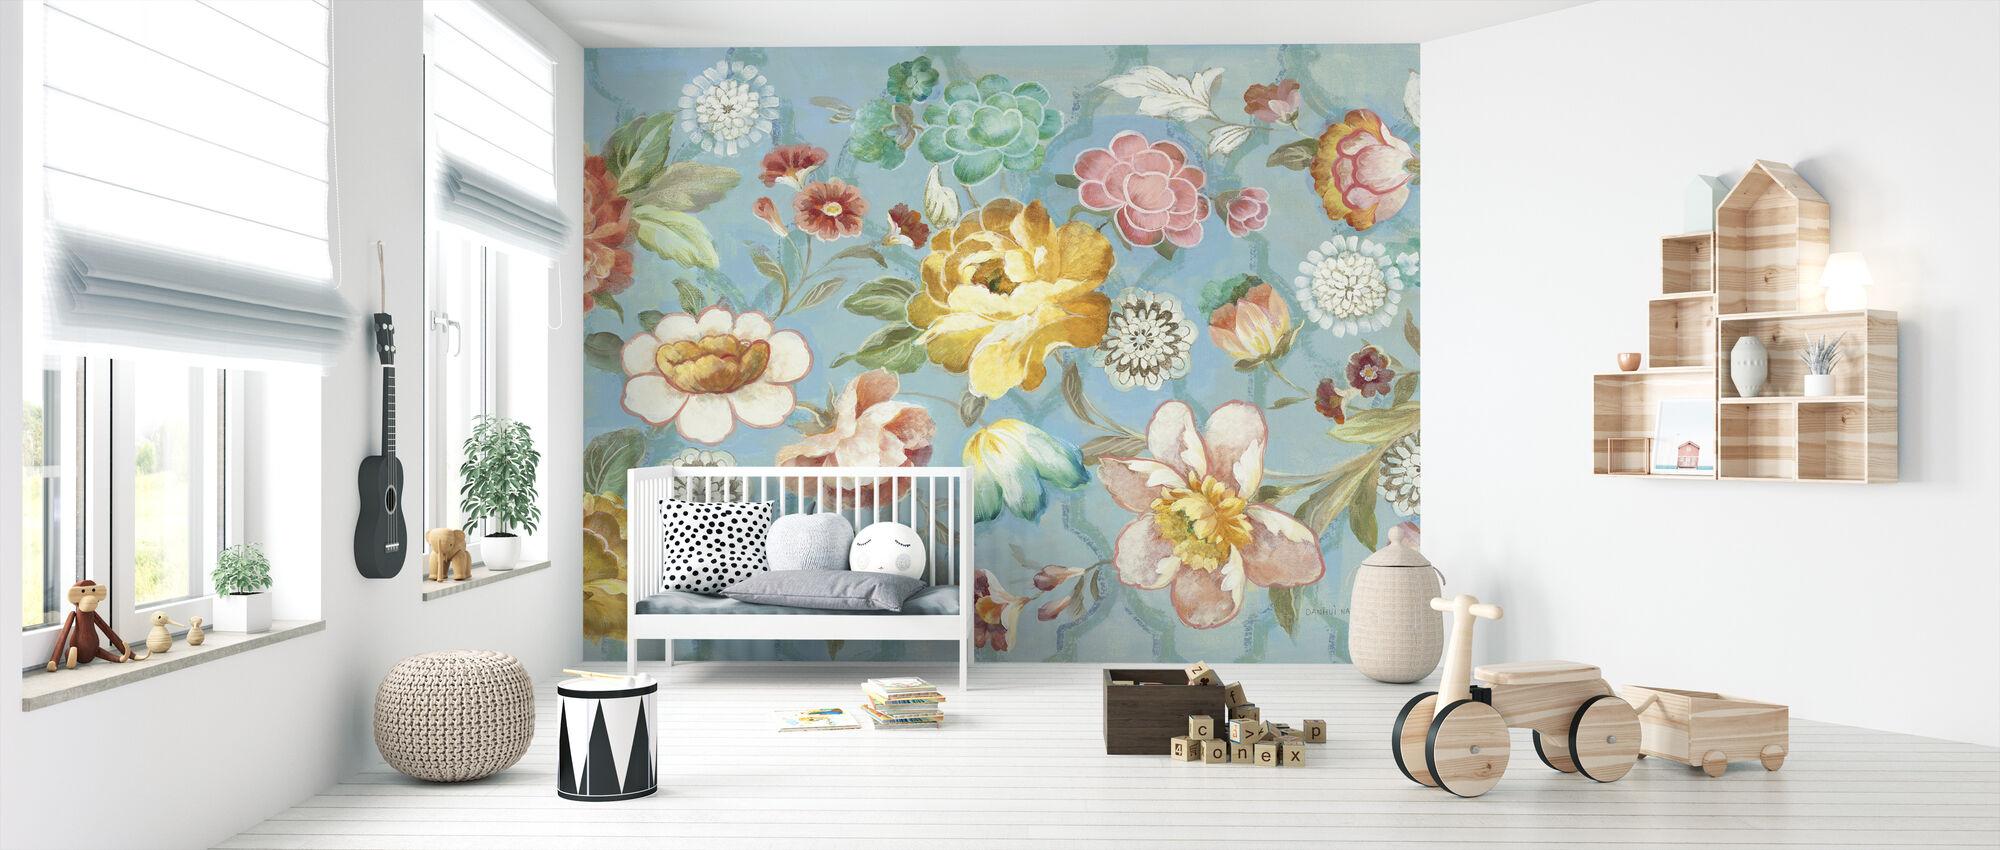 Garden of Delights - Wallpaper - Nursery